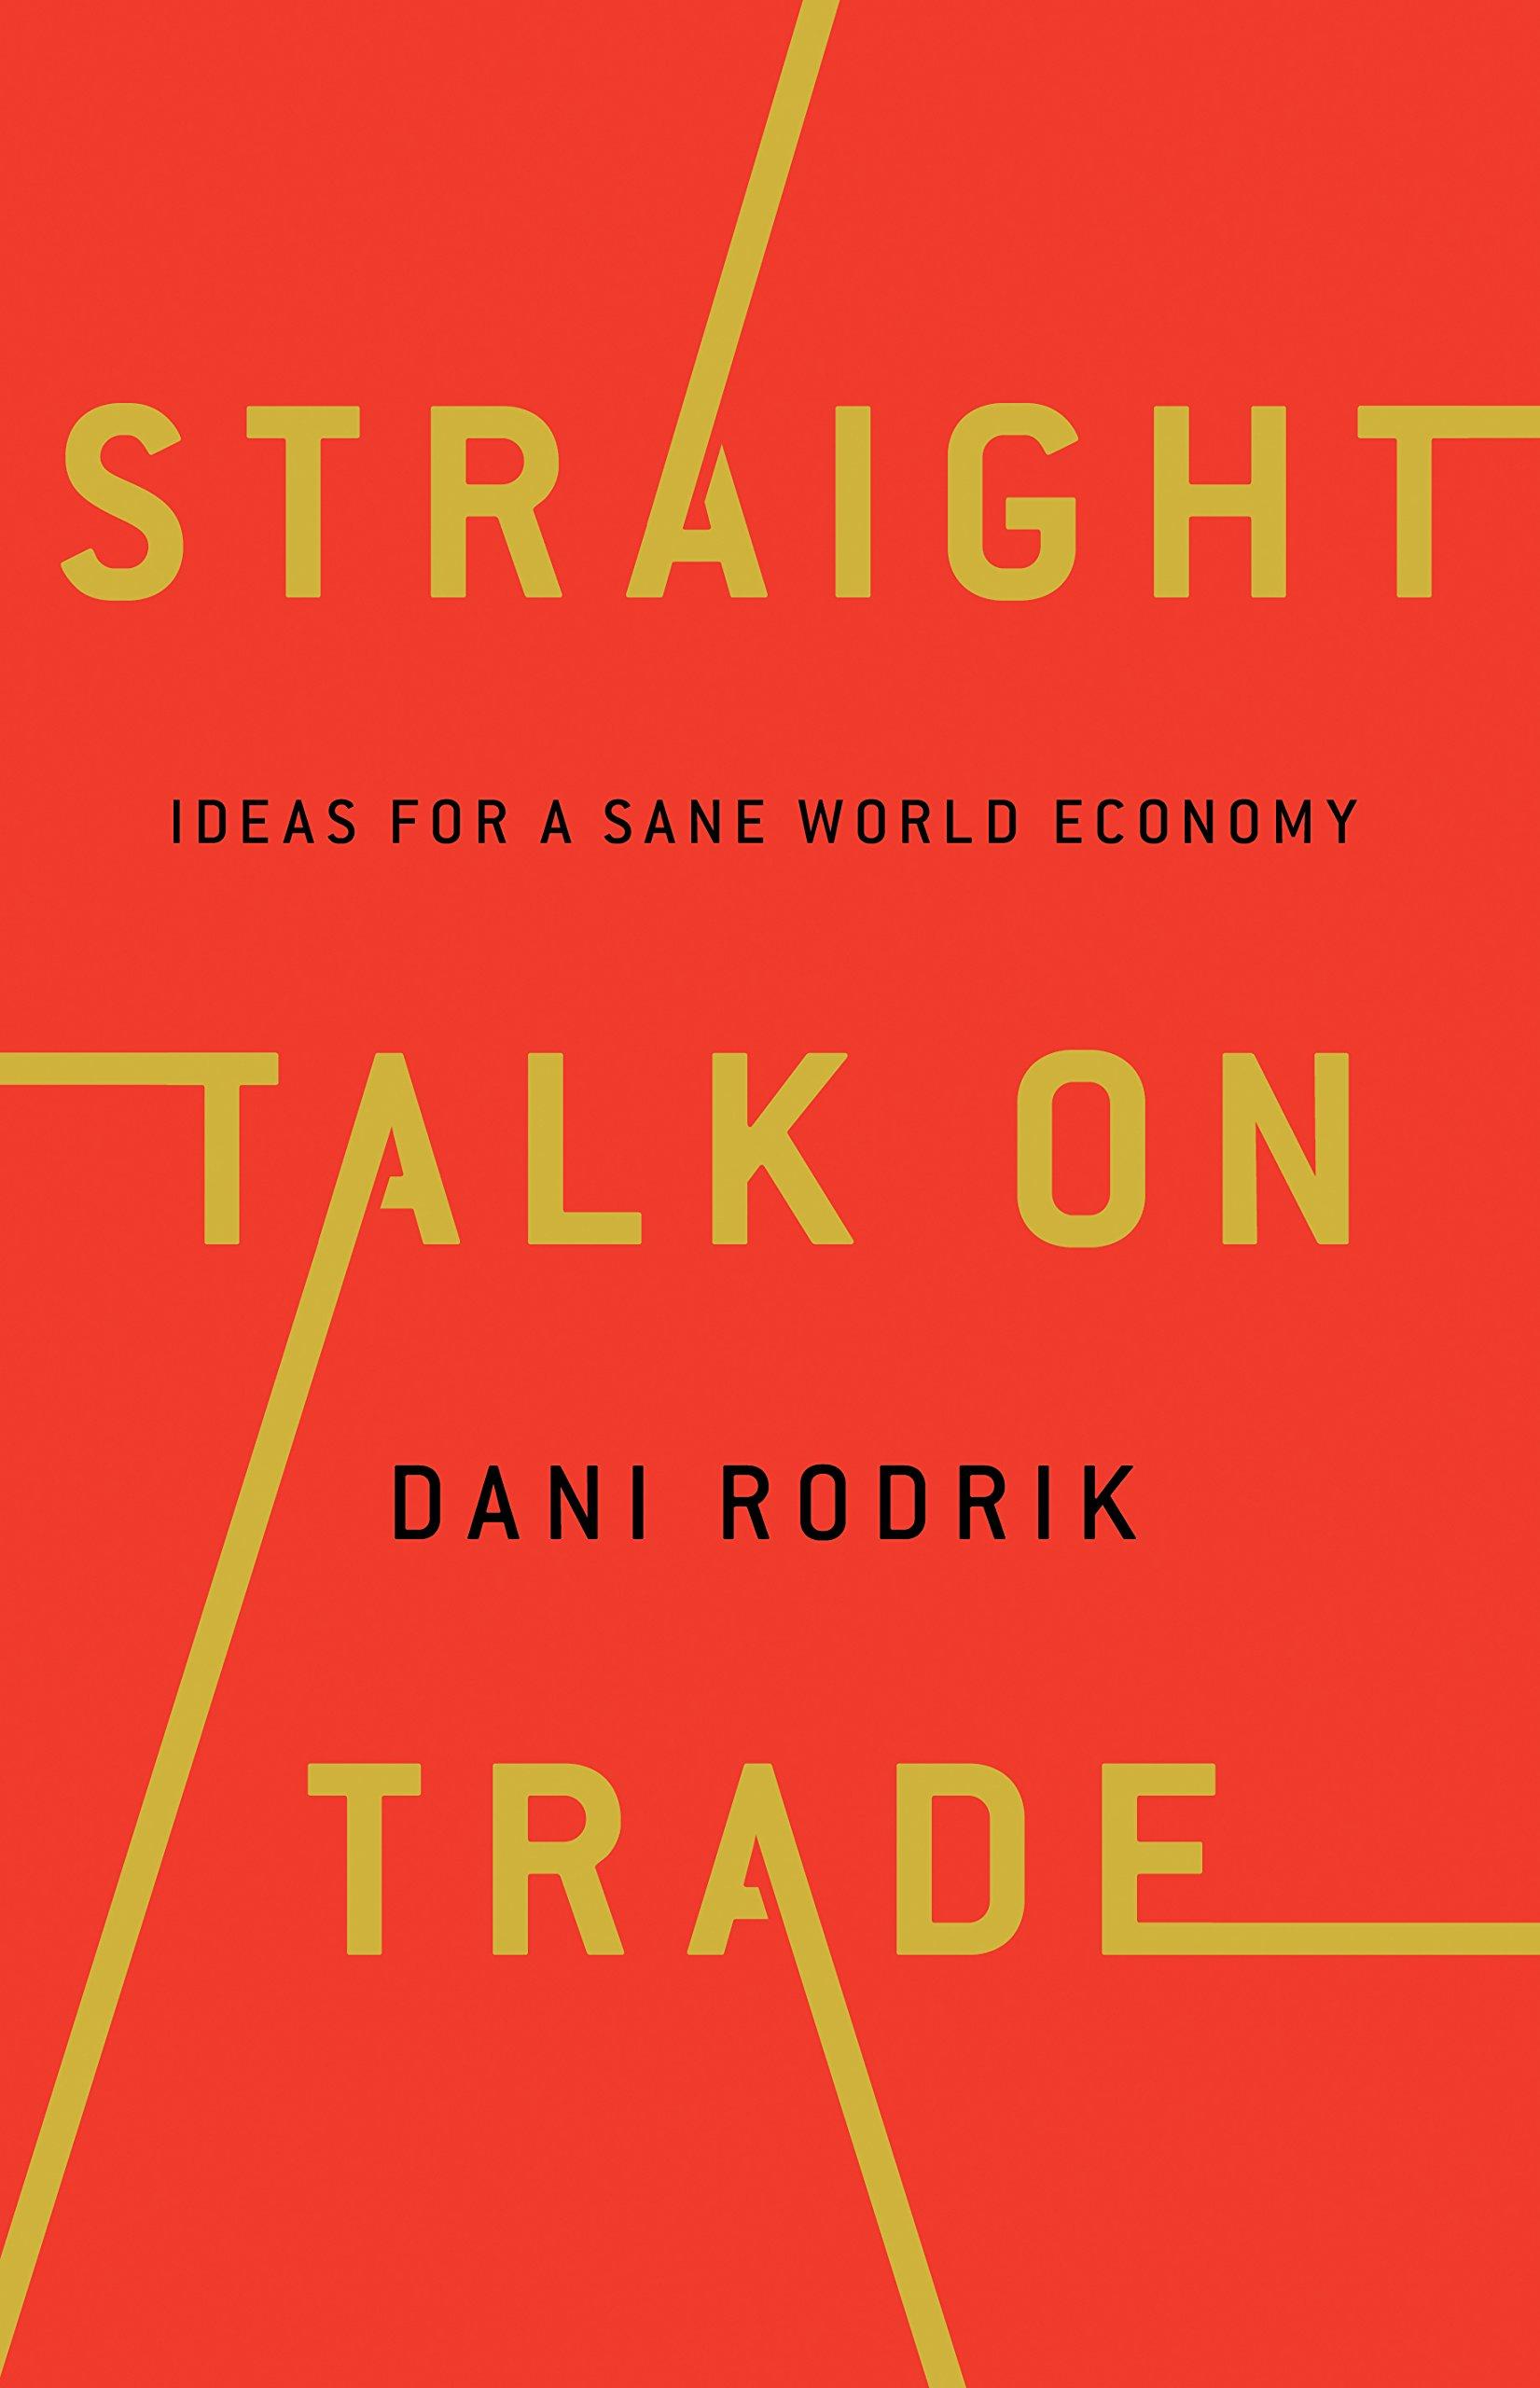 Straight Talk On Trade  Ideas For A Sane World Economy